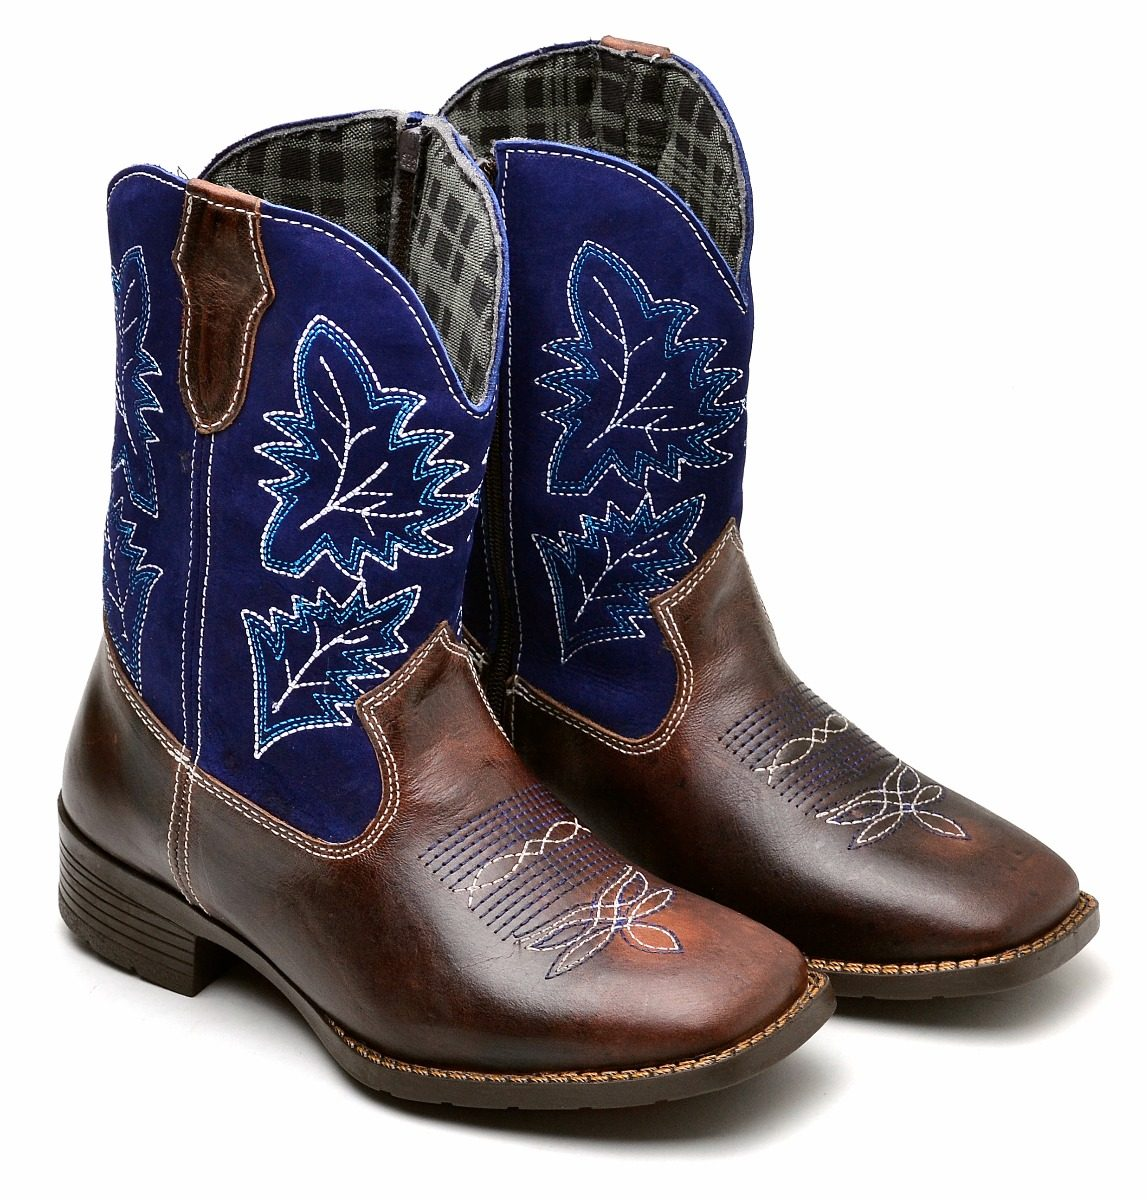 bota country masculina cano longo texana rodeio couro peao. Carregando zoom. 02342deb9e8